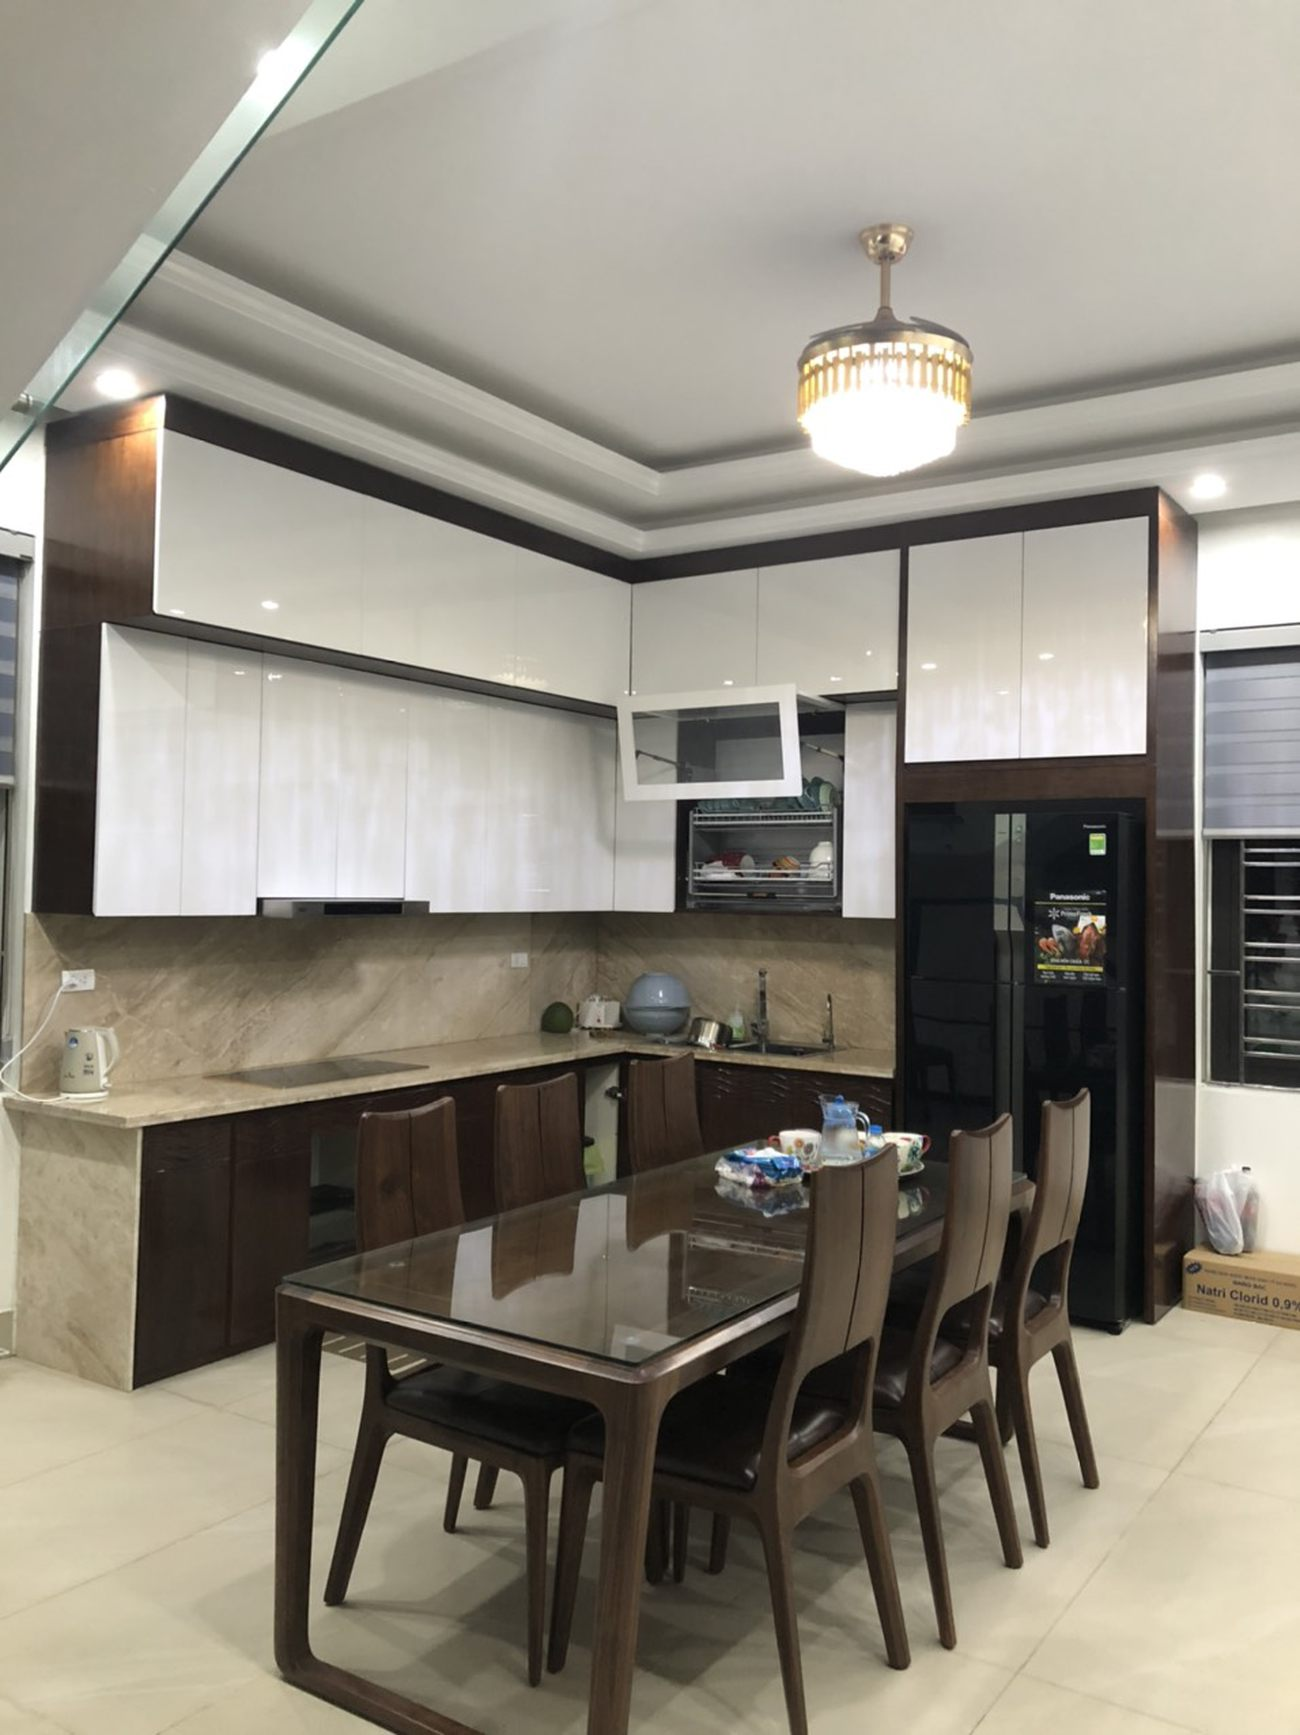 ho-mshangs-house-in-quang-ninh-kitchenjpg-1629794623.jpg